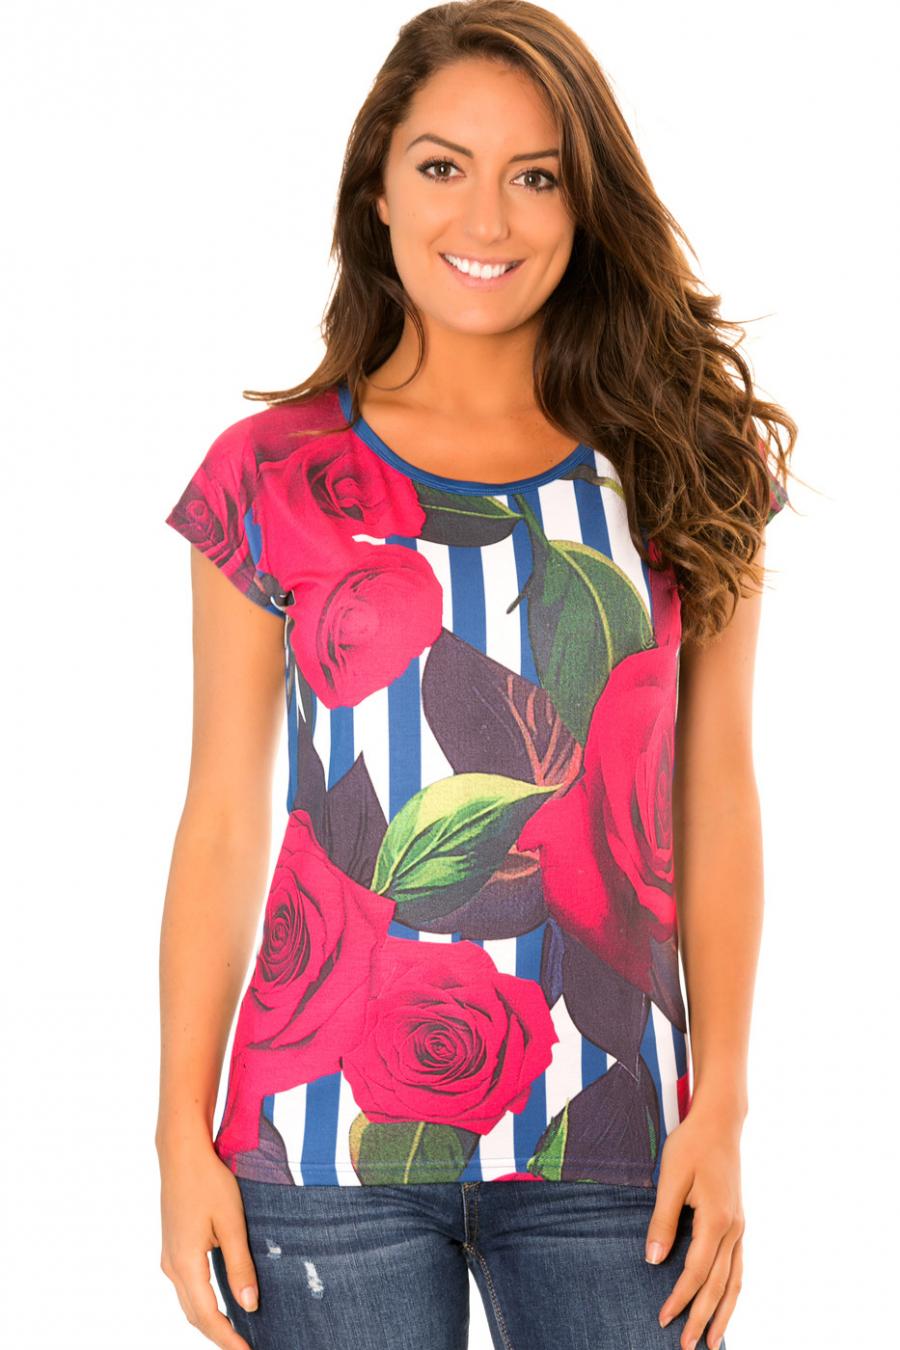 Soepel gestreept t-shirt Marineblauw, Wit met bloemenpatroon - MC1664